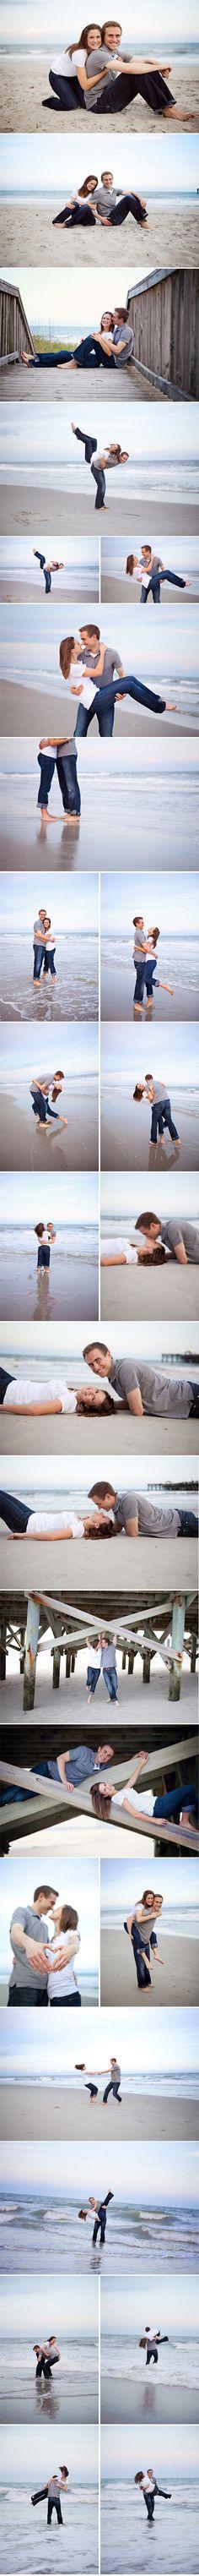 Engagement photos on the beach! So cute